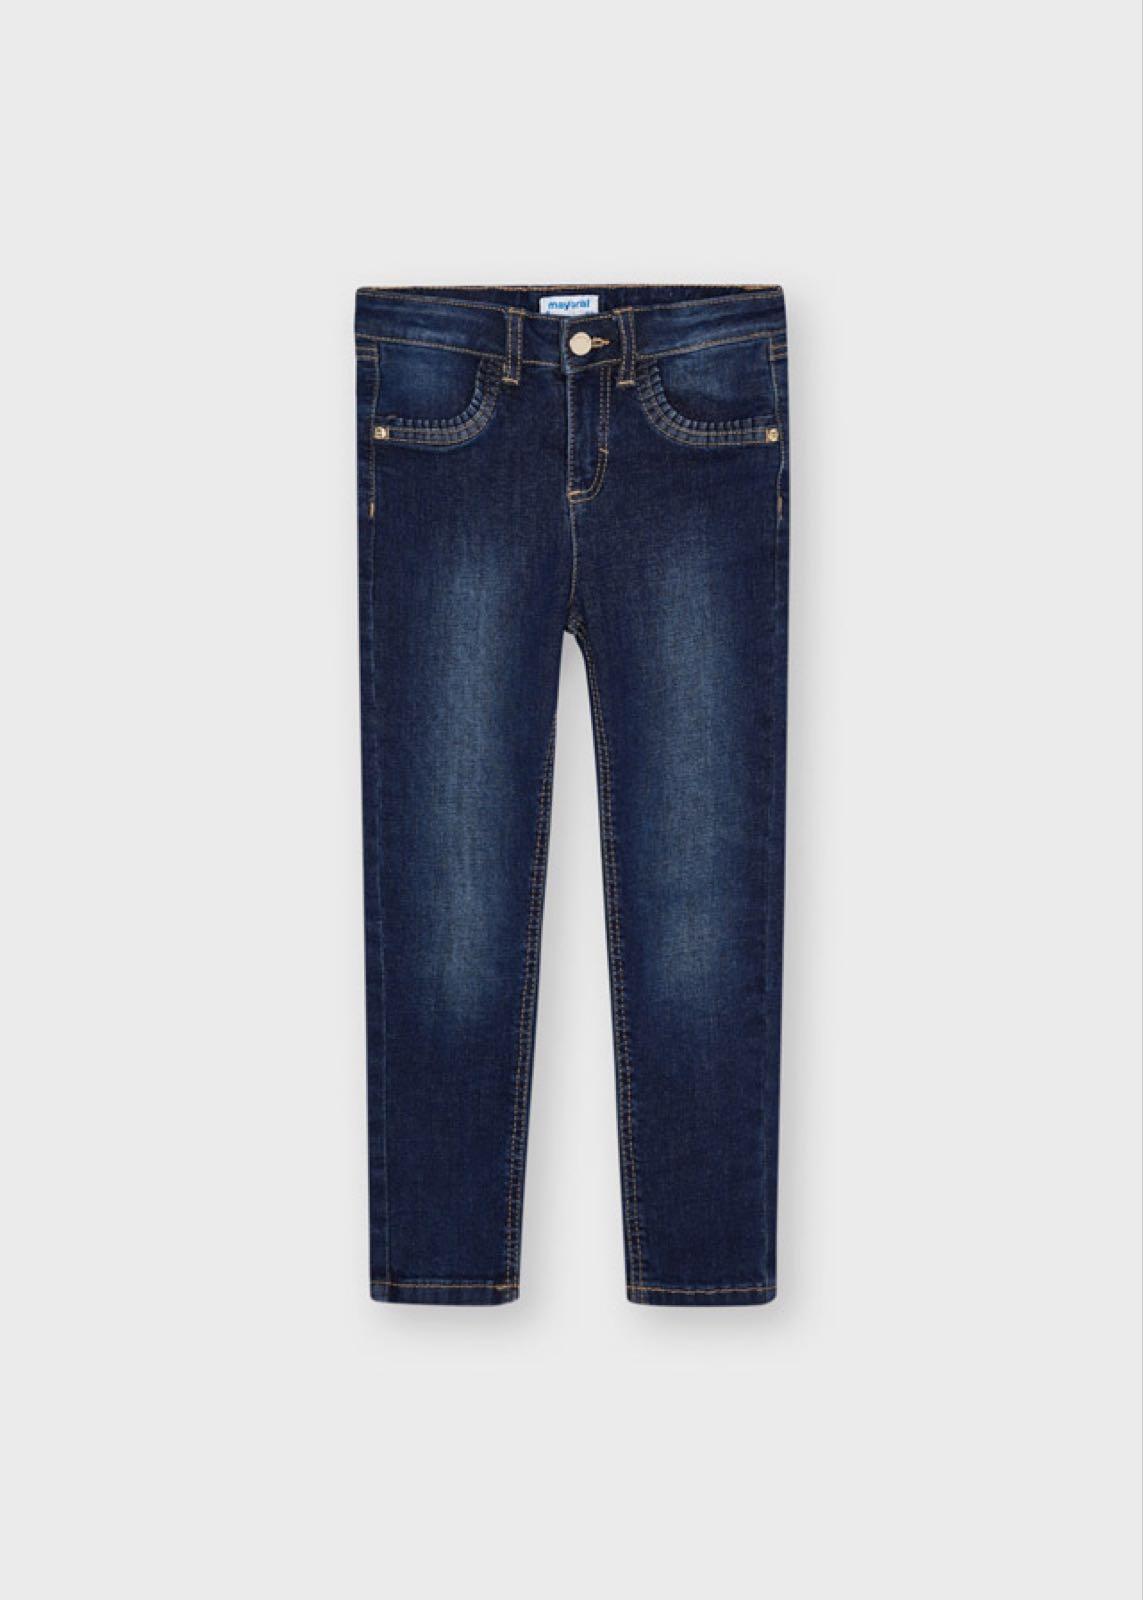 MAYORAL GIRLS Basic Skinny Jeans Dark Blue 527-60